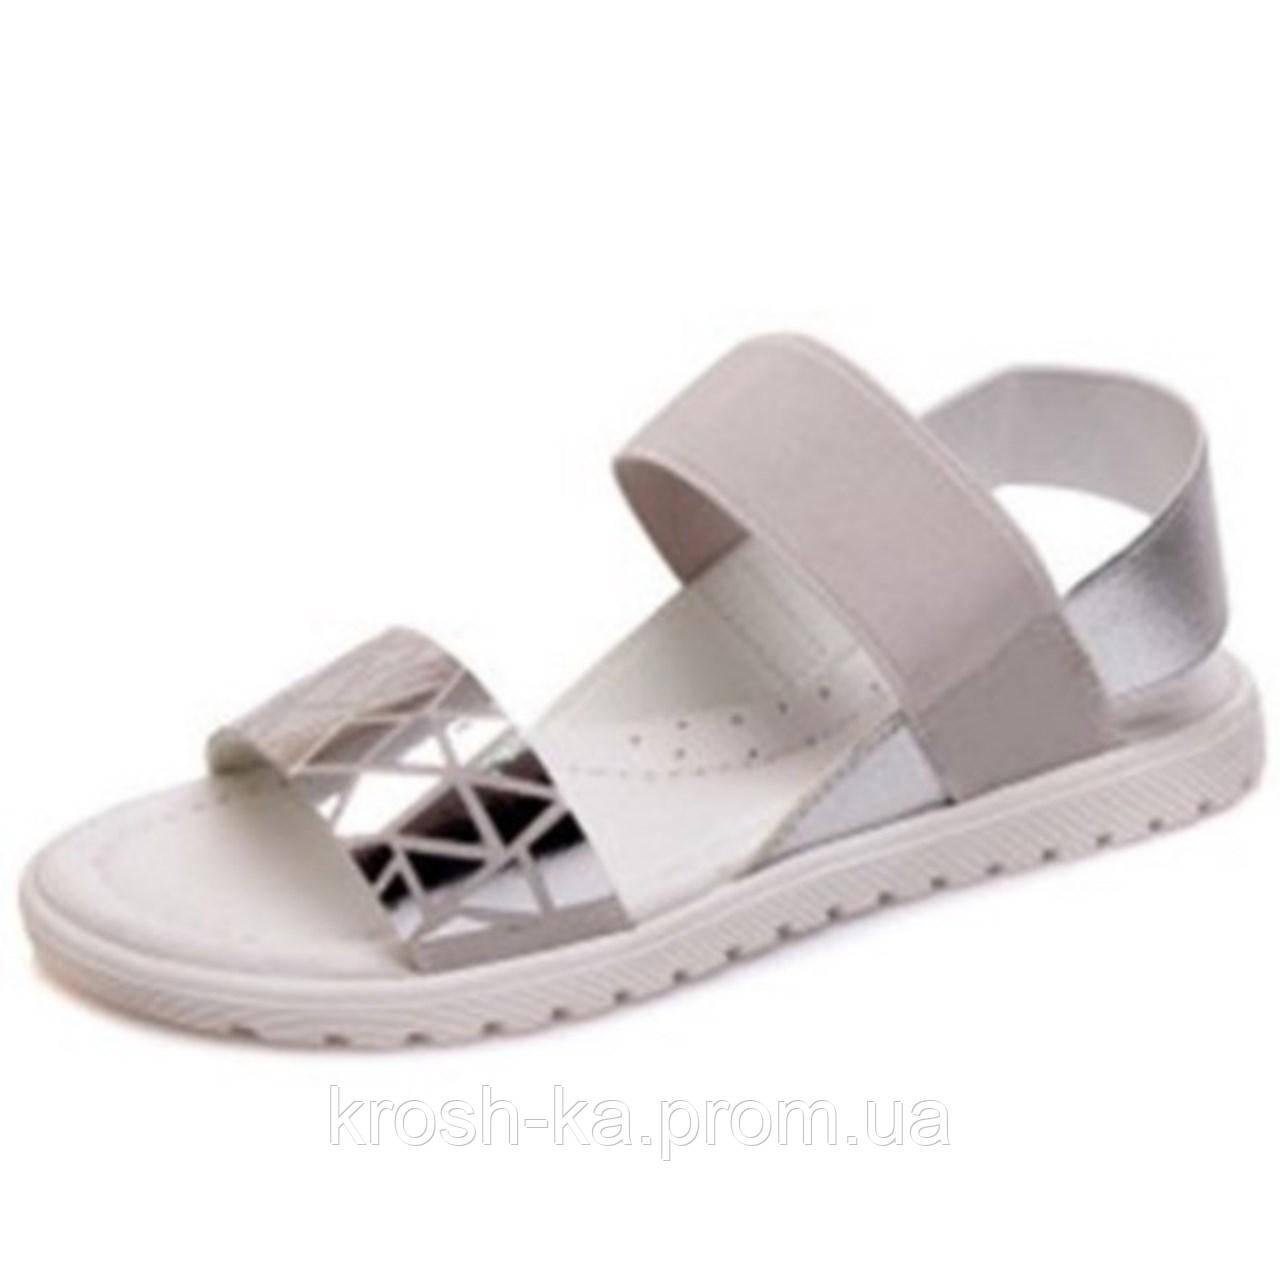 Босоножки для девочки серебро (32-37)р Weestep Китай R230251055